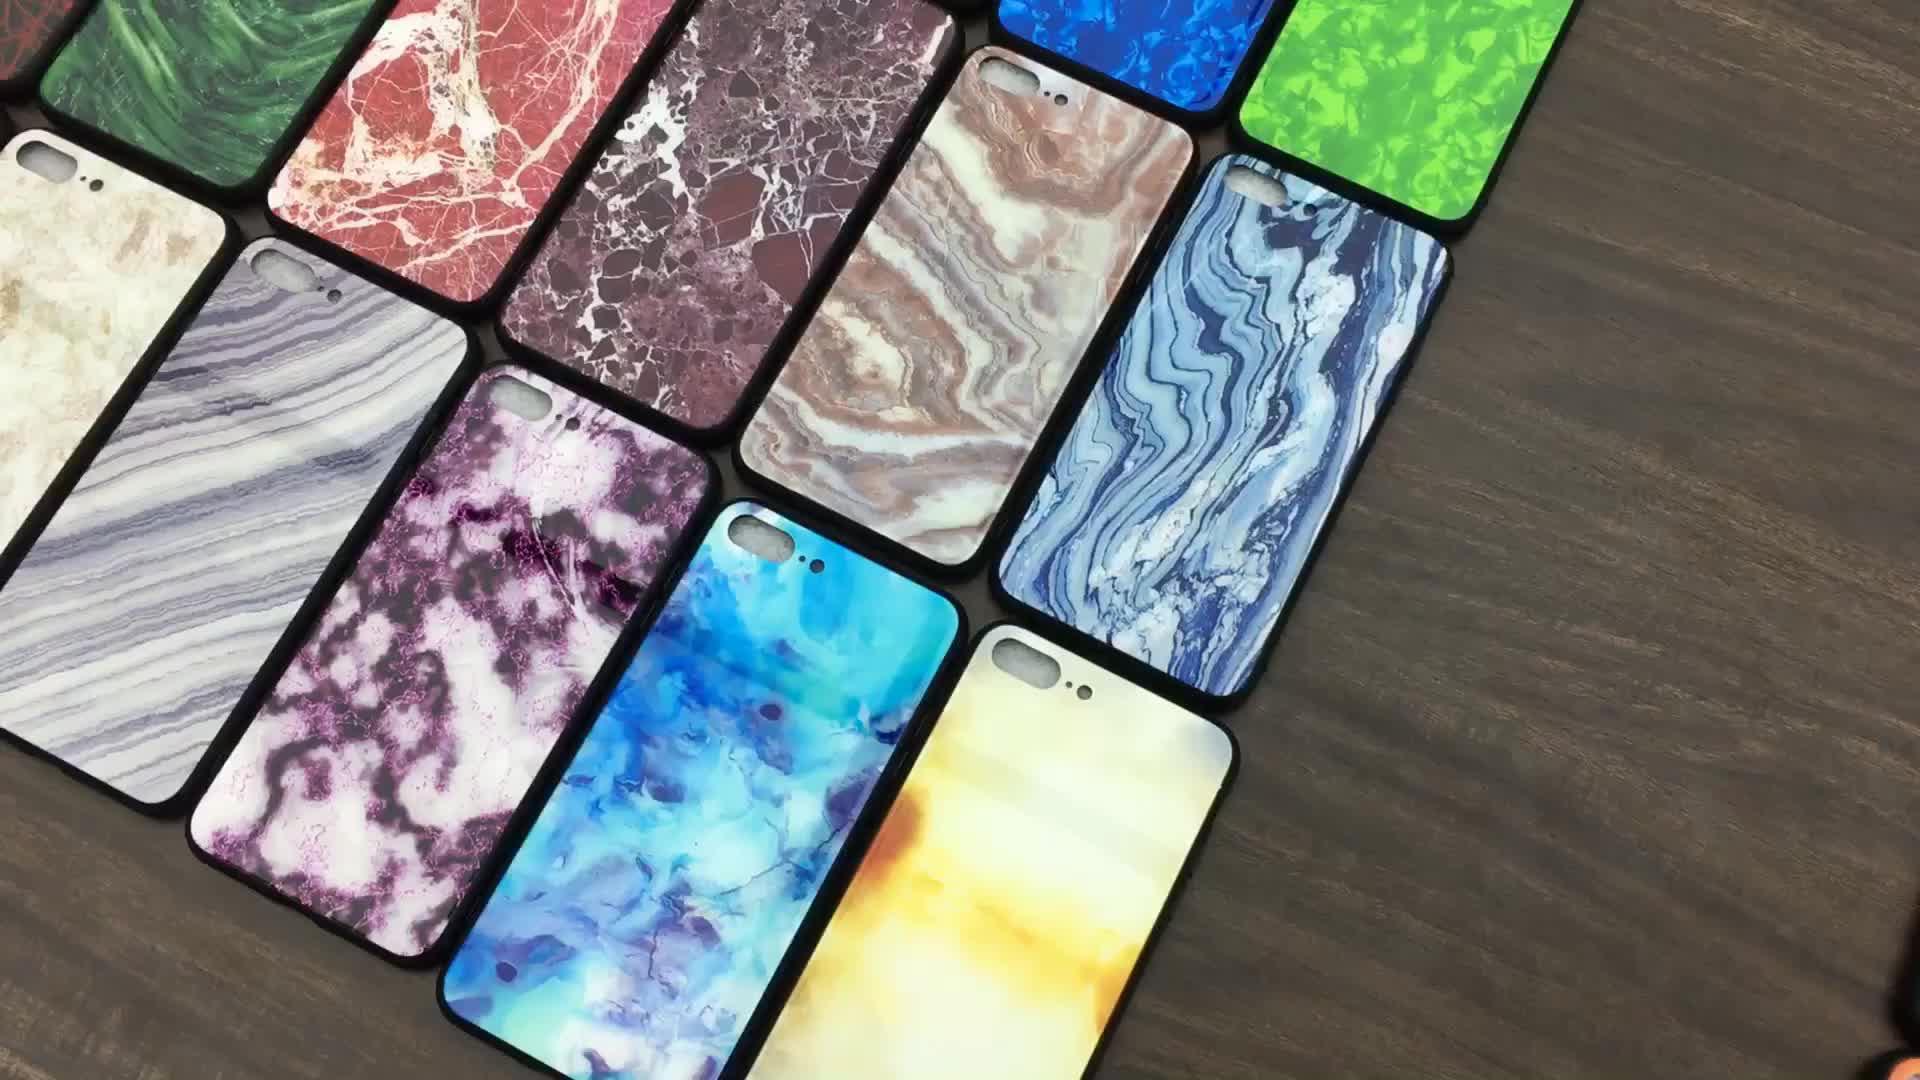 2018 heißer Verkauf Anti-Scratch Stoßfest Gehärtetem Glas Telefon Fall für Vivo Y71 V5